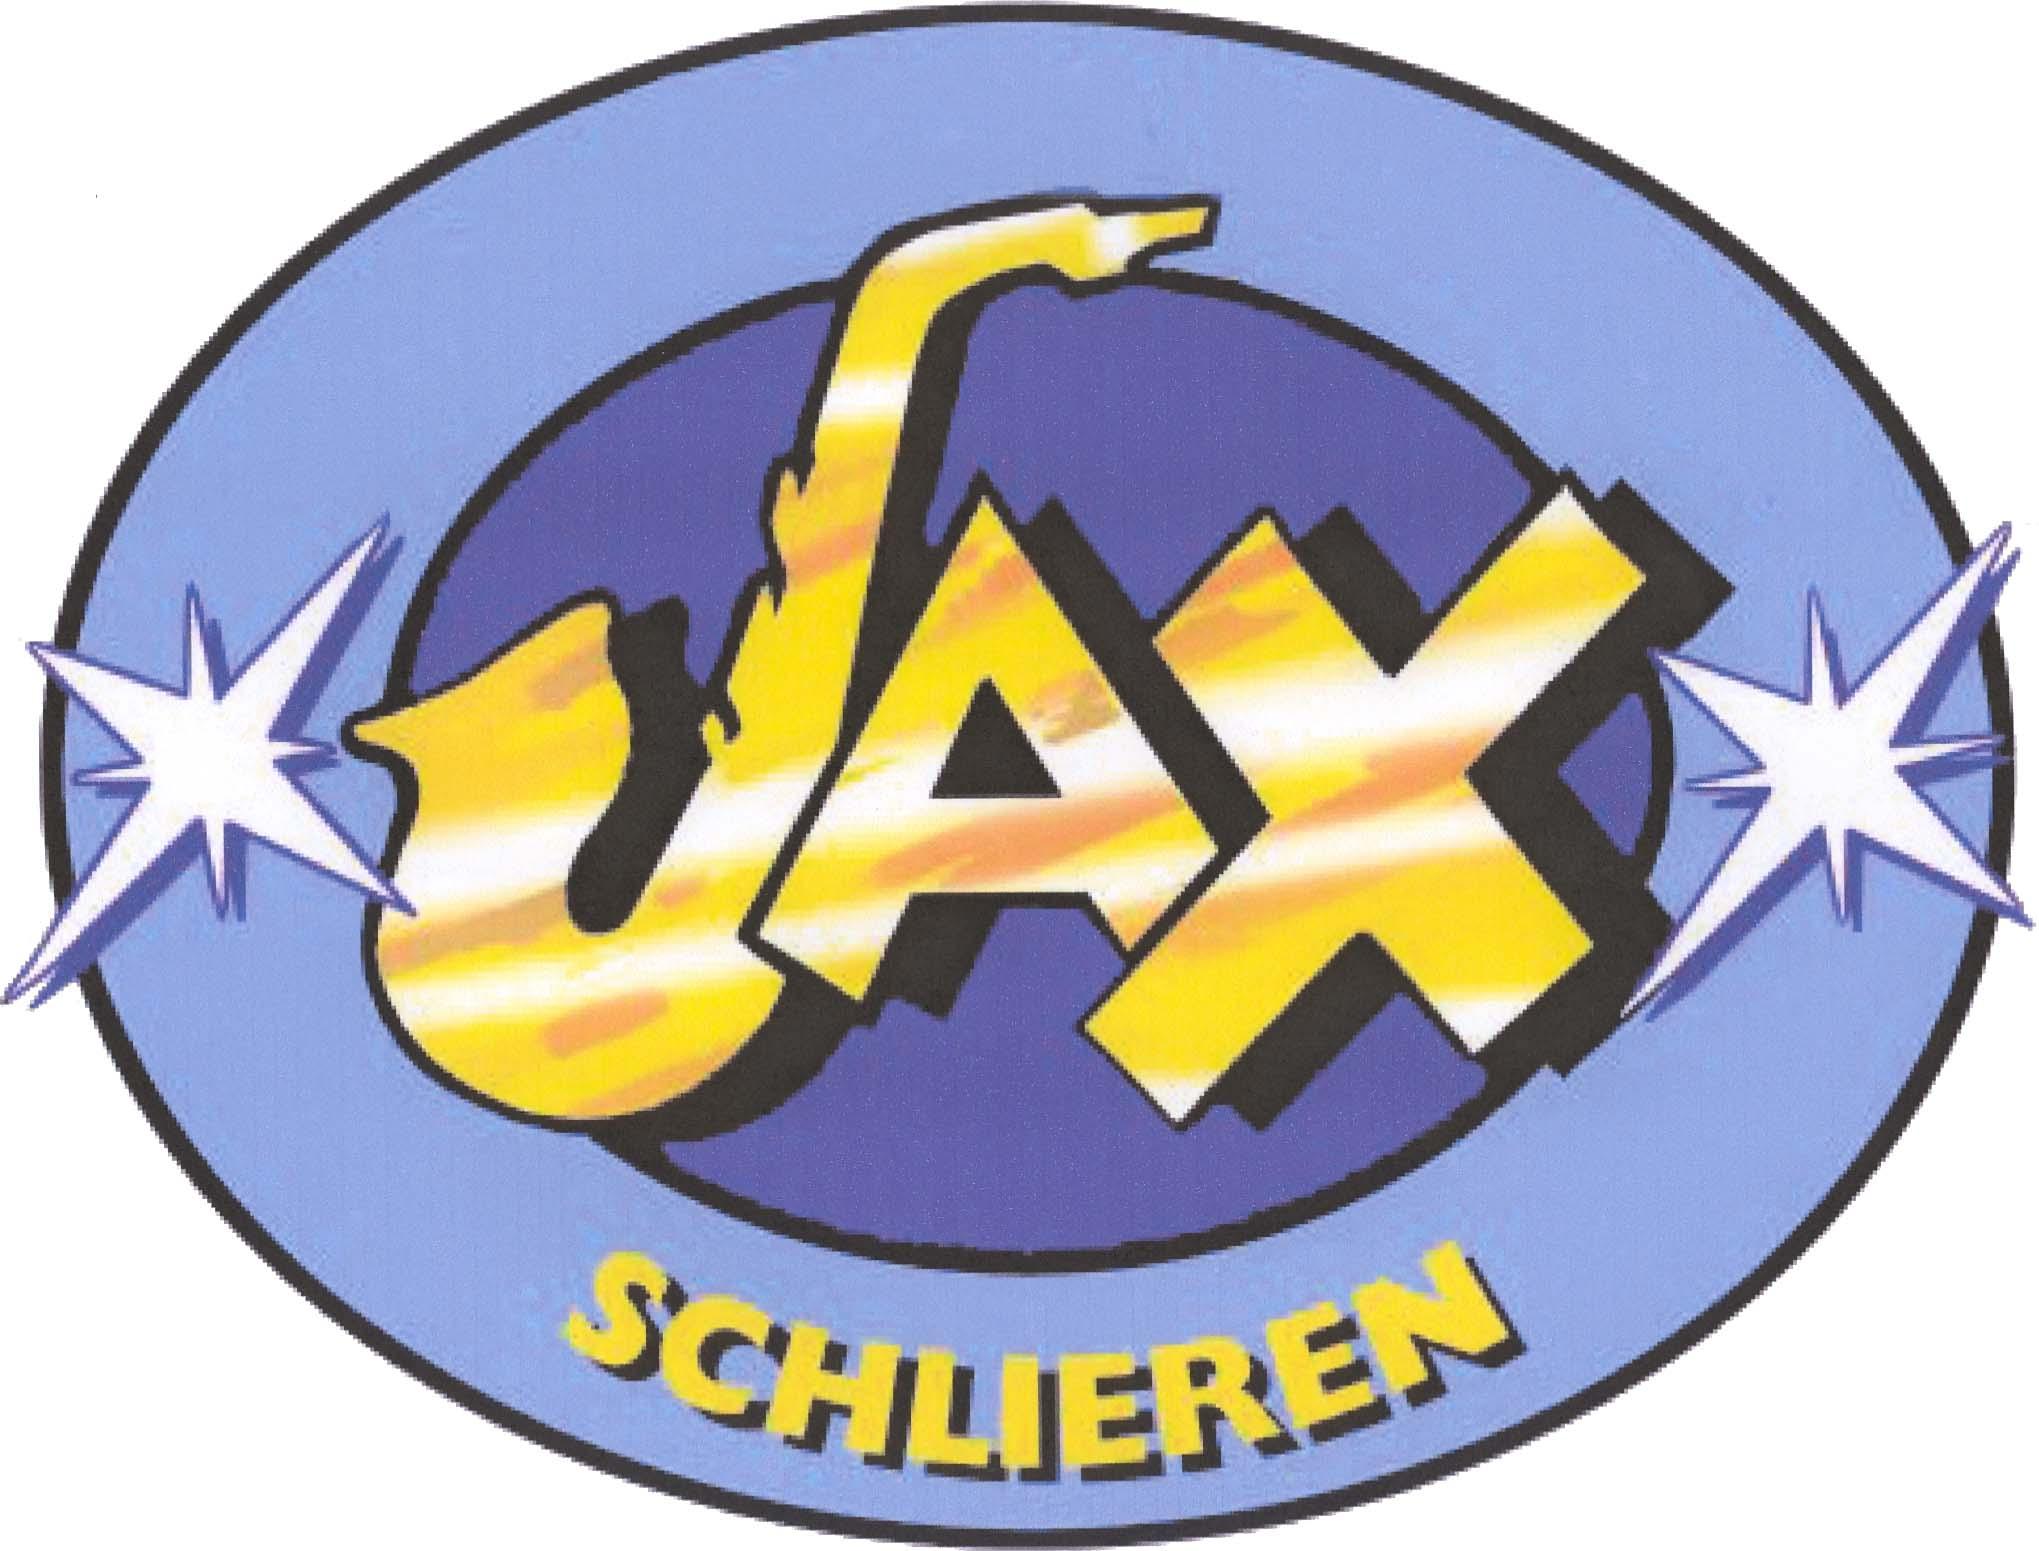 Club Sax - Discothek